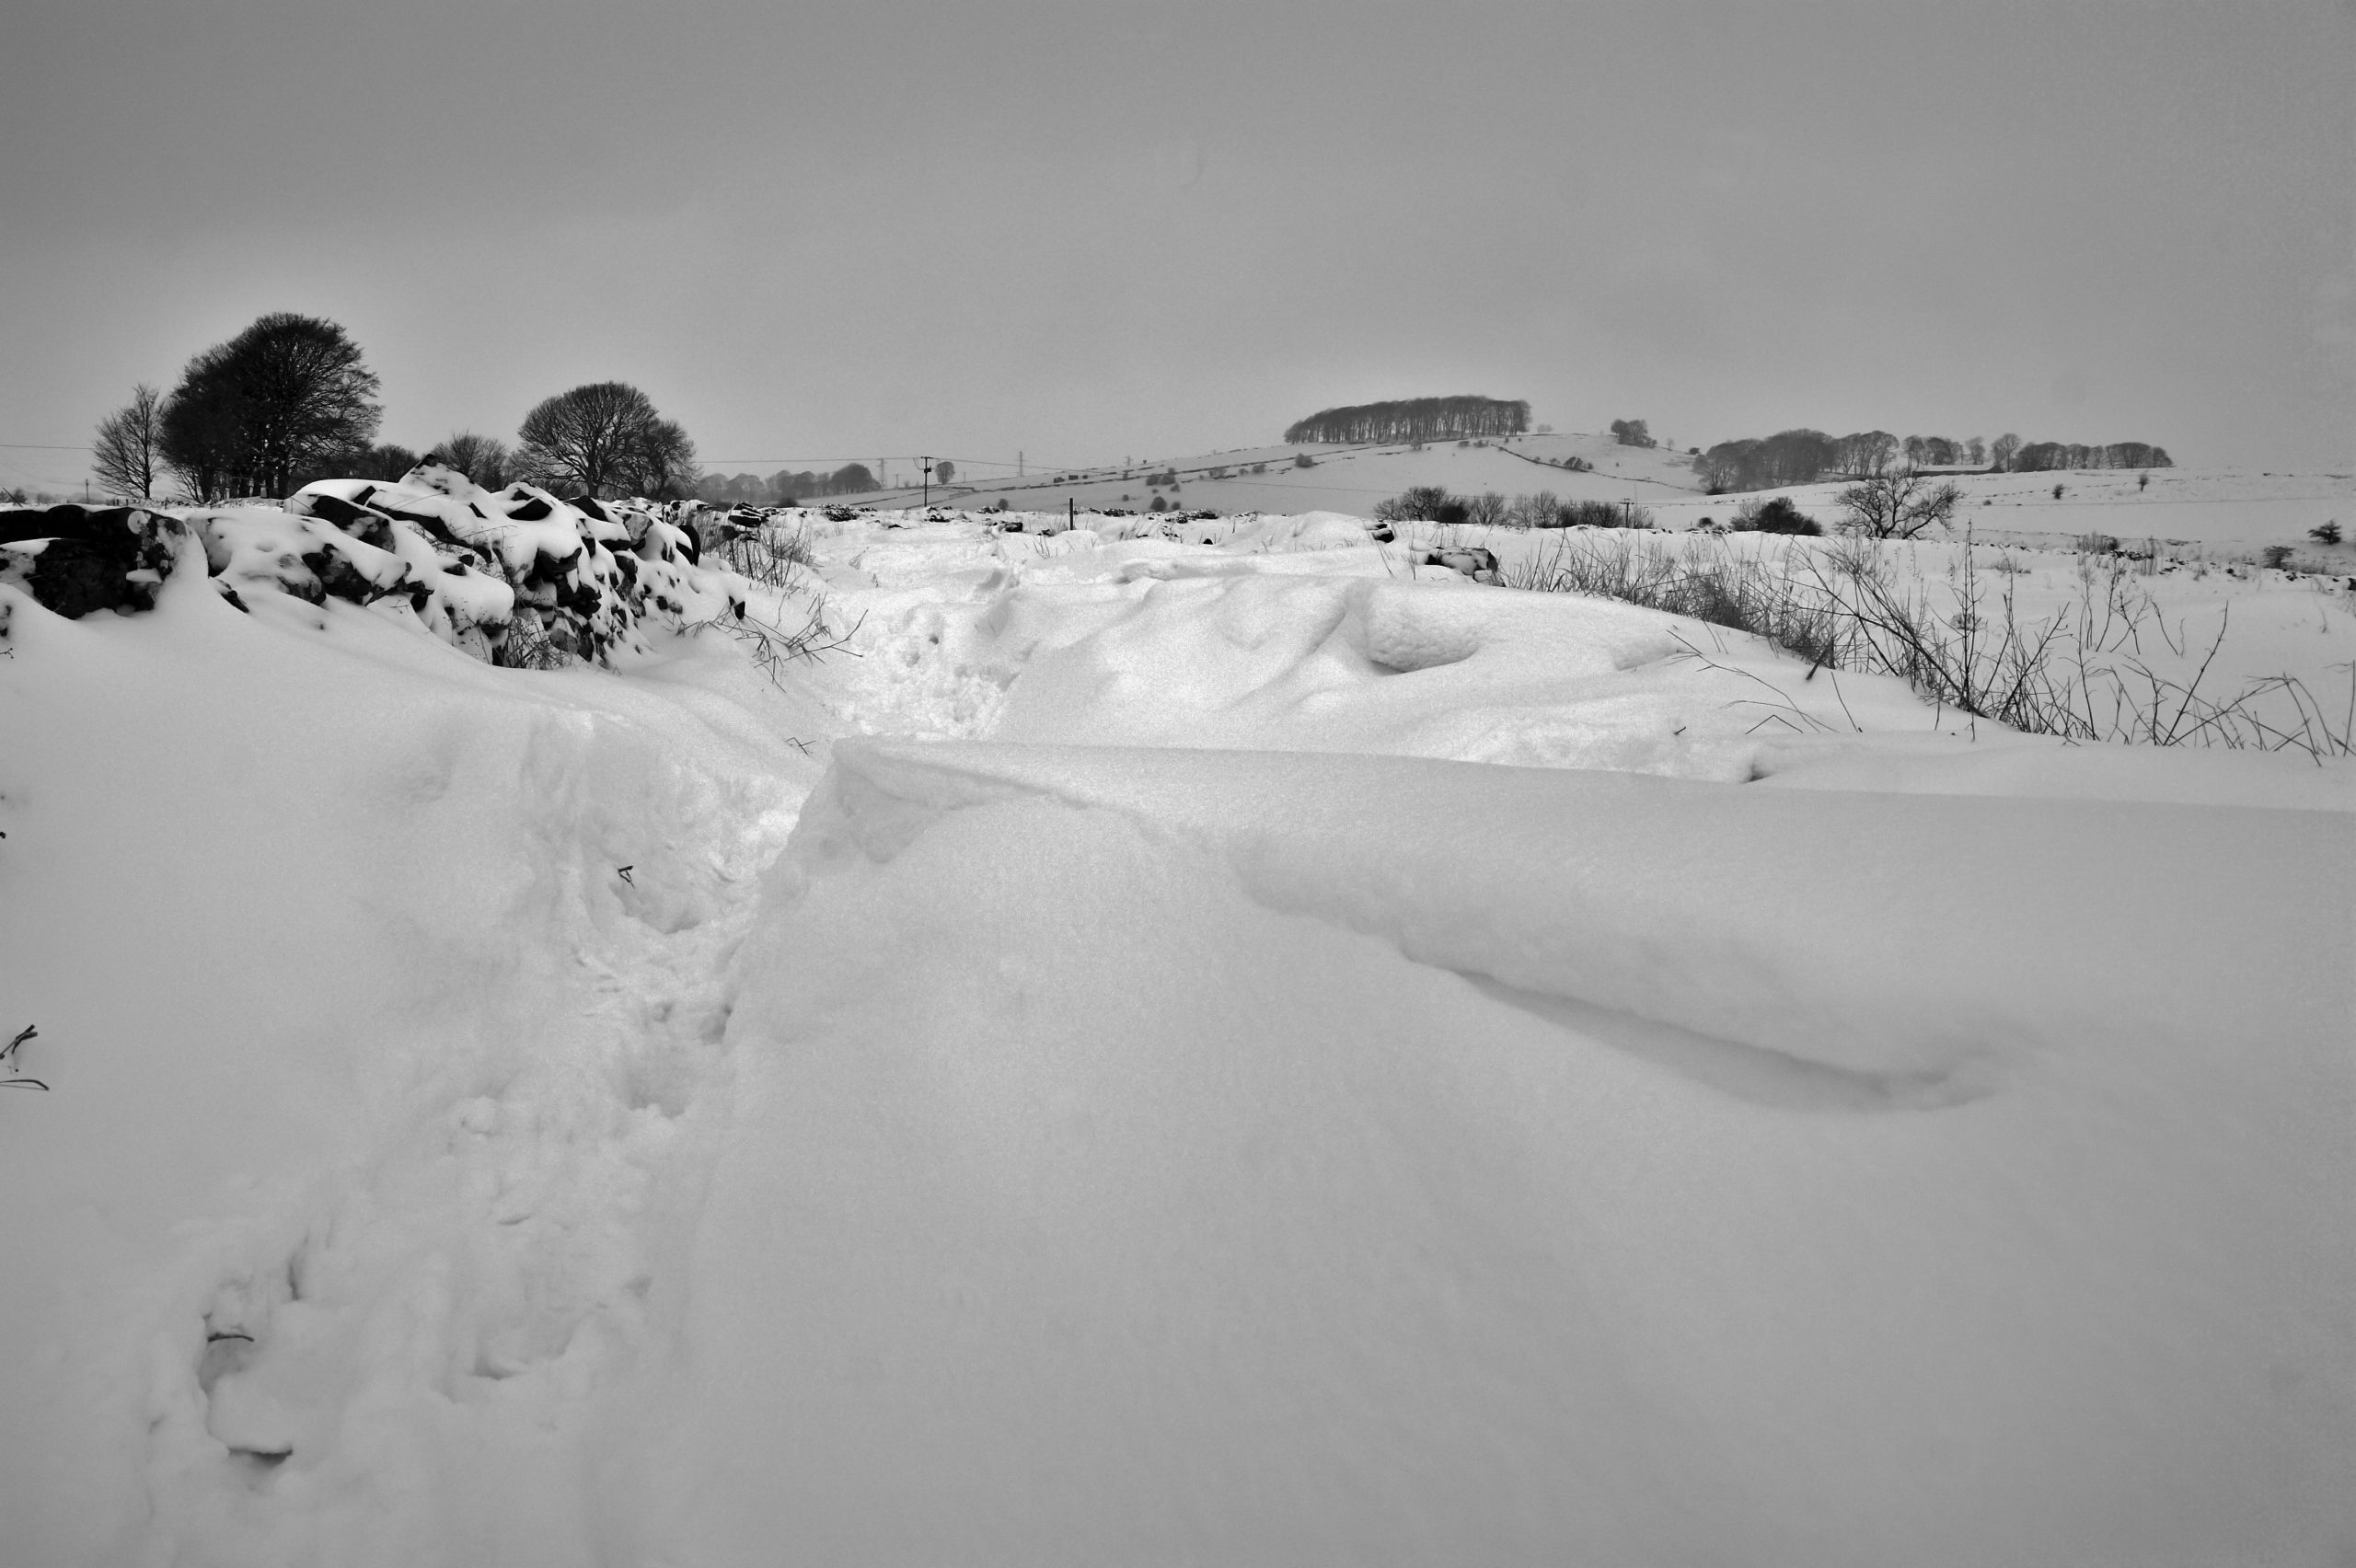 Snowdrift by Simon Harrod via Flickr CC